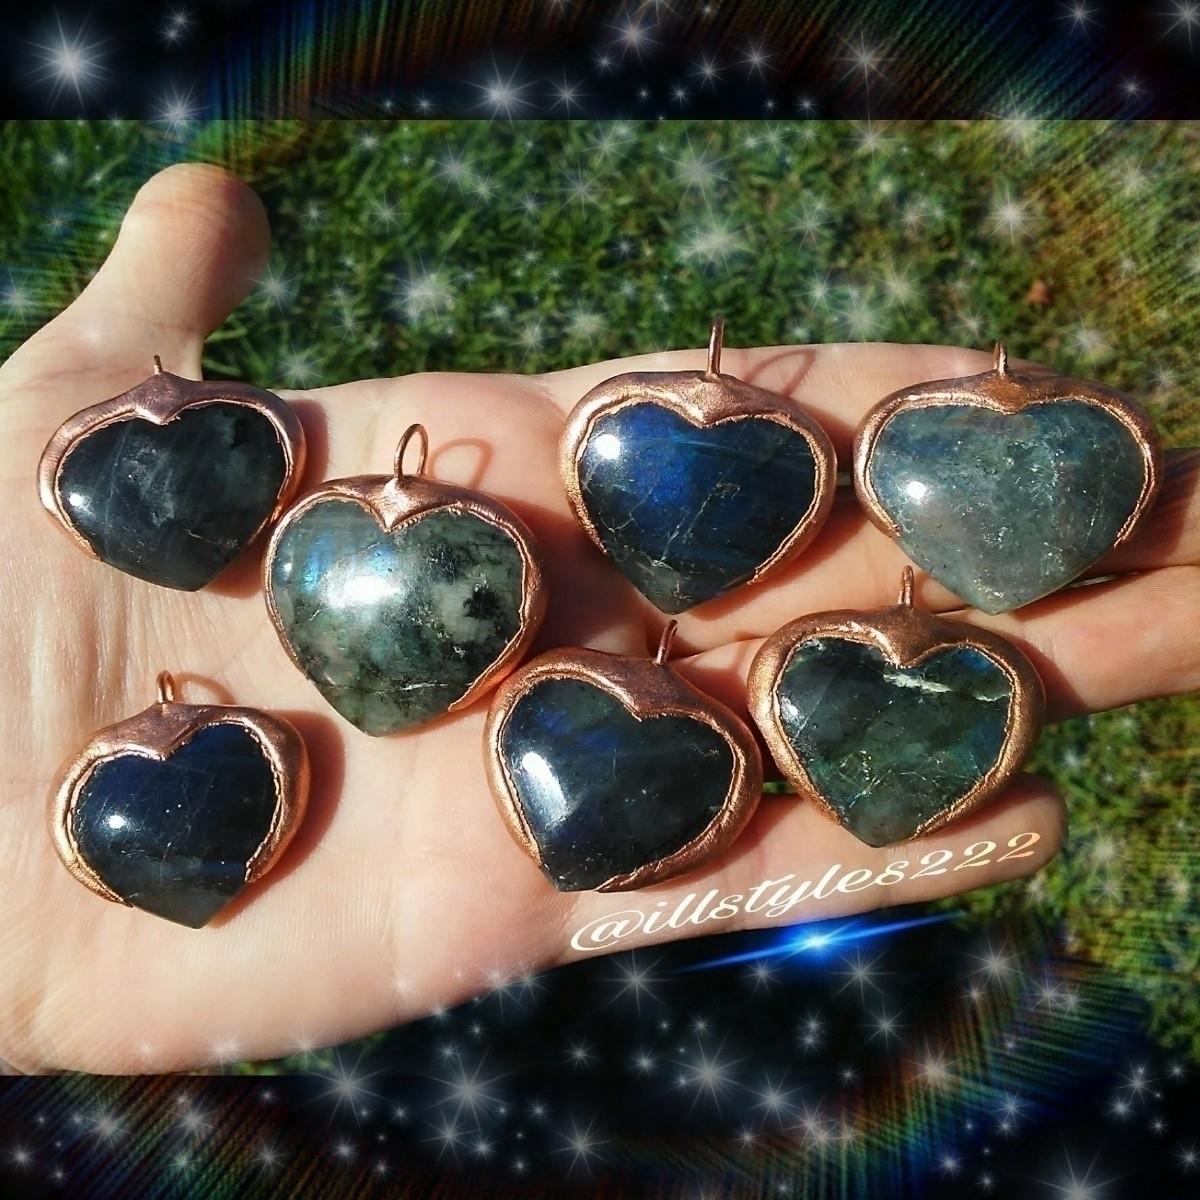 Copper Labradorite Heart Pendan - illstyles222 | ello